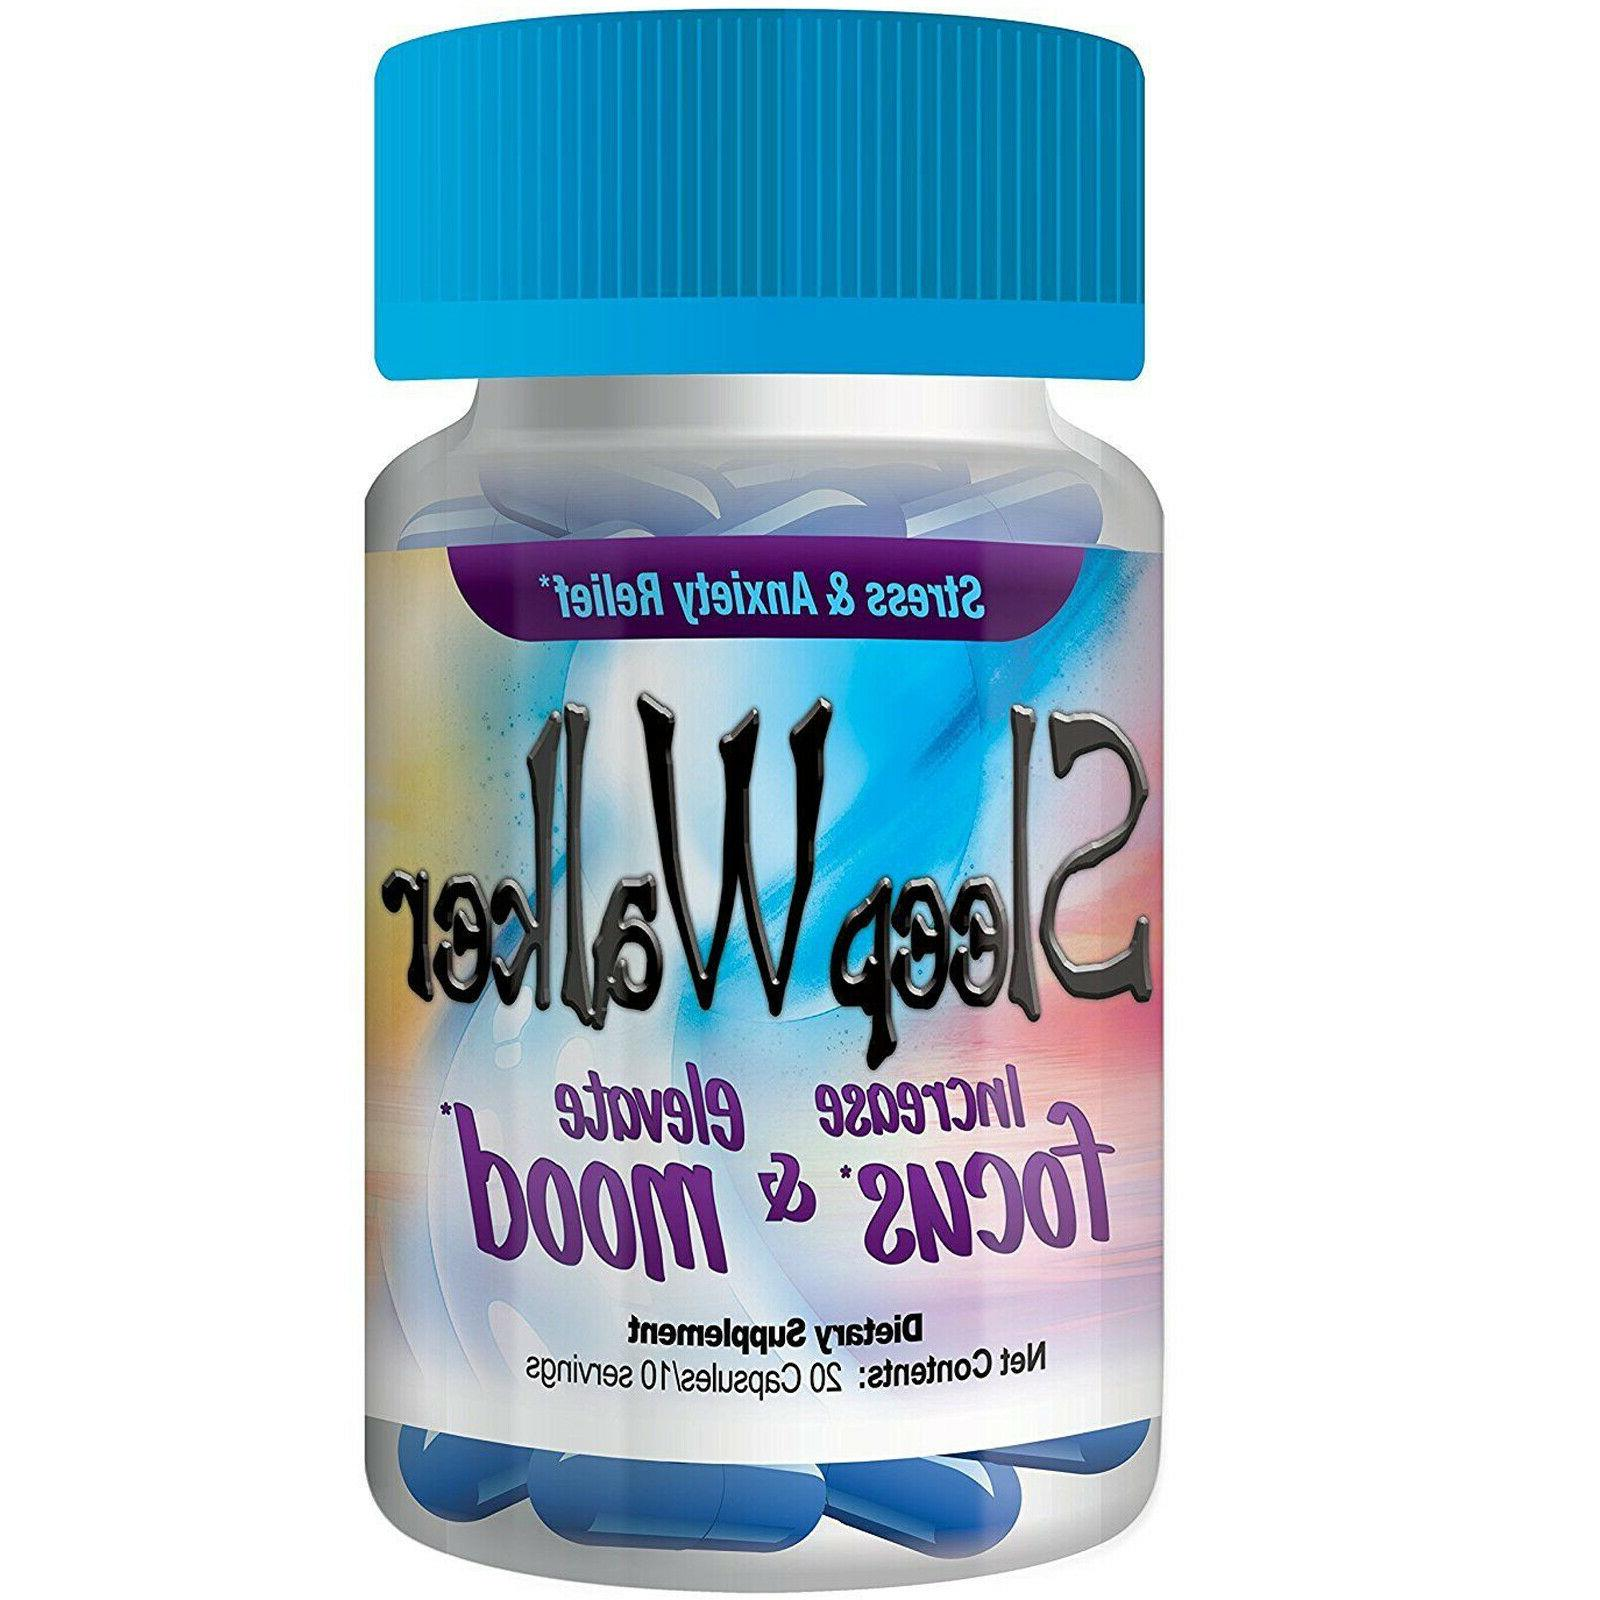 100 Pills Sleep Capsules & Mood Optimizer BOTTLES